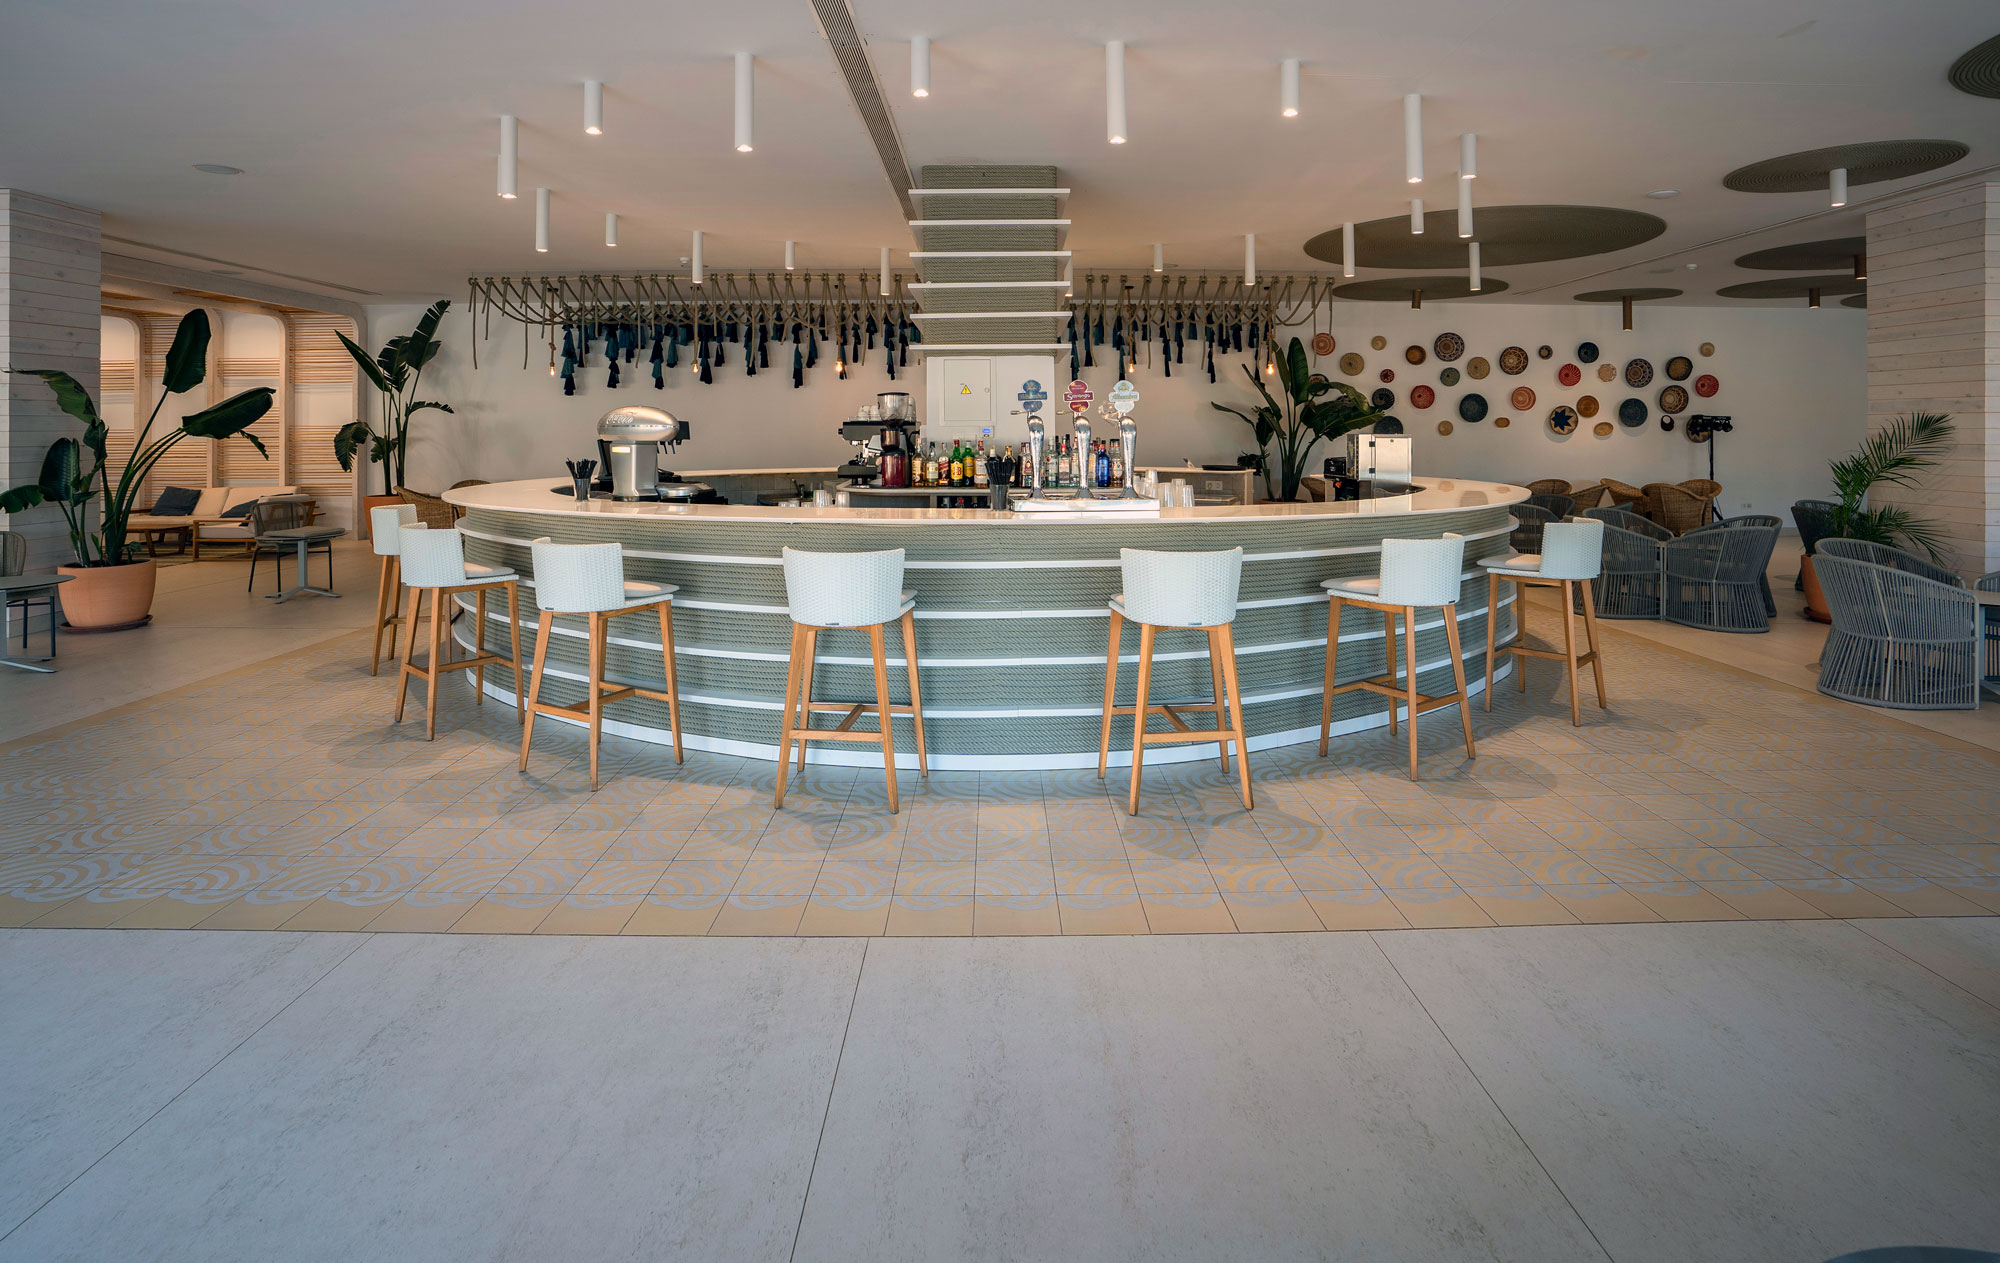 Hotel Mediterráneo  - Hotel Mediterraneo Park 7 Dekton Silestone Piedra Natural Cosentino 190